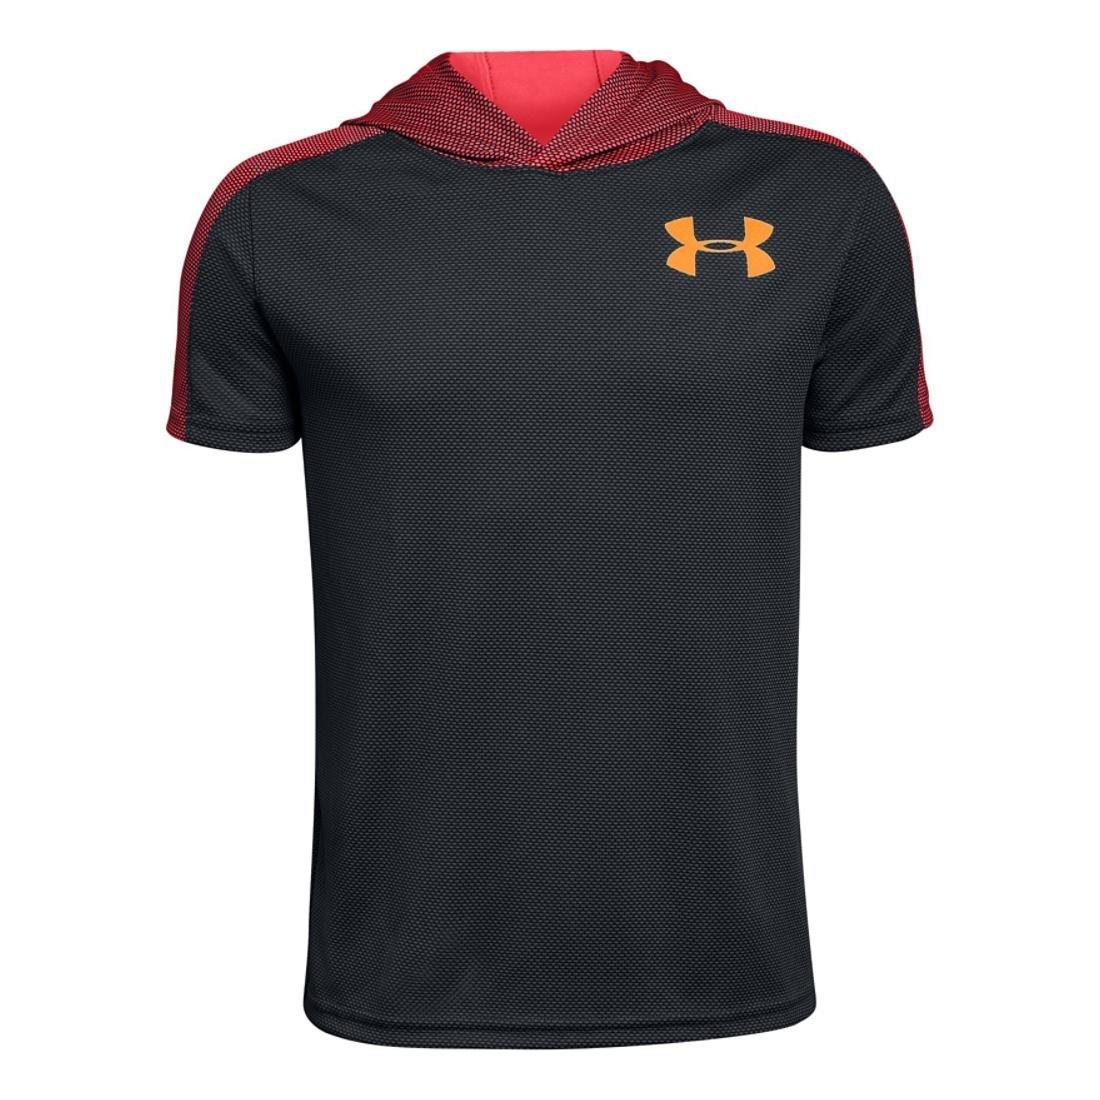 Under Armour Boys Textured Tech Short Sleeve Hood, Grey/Coral/Orange, YL